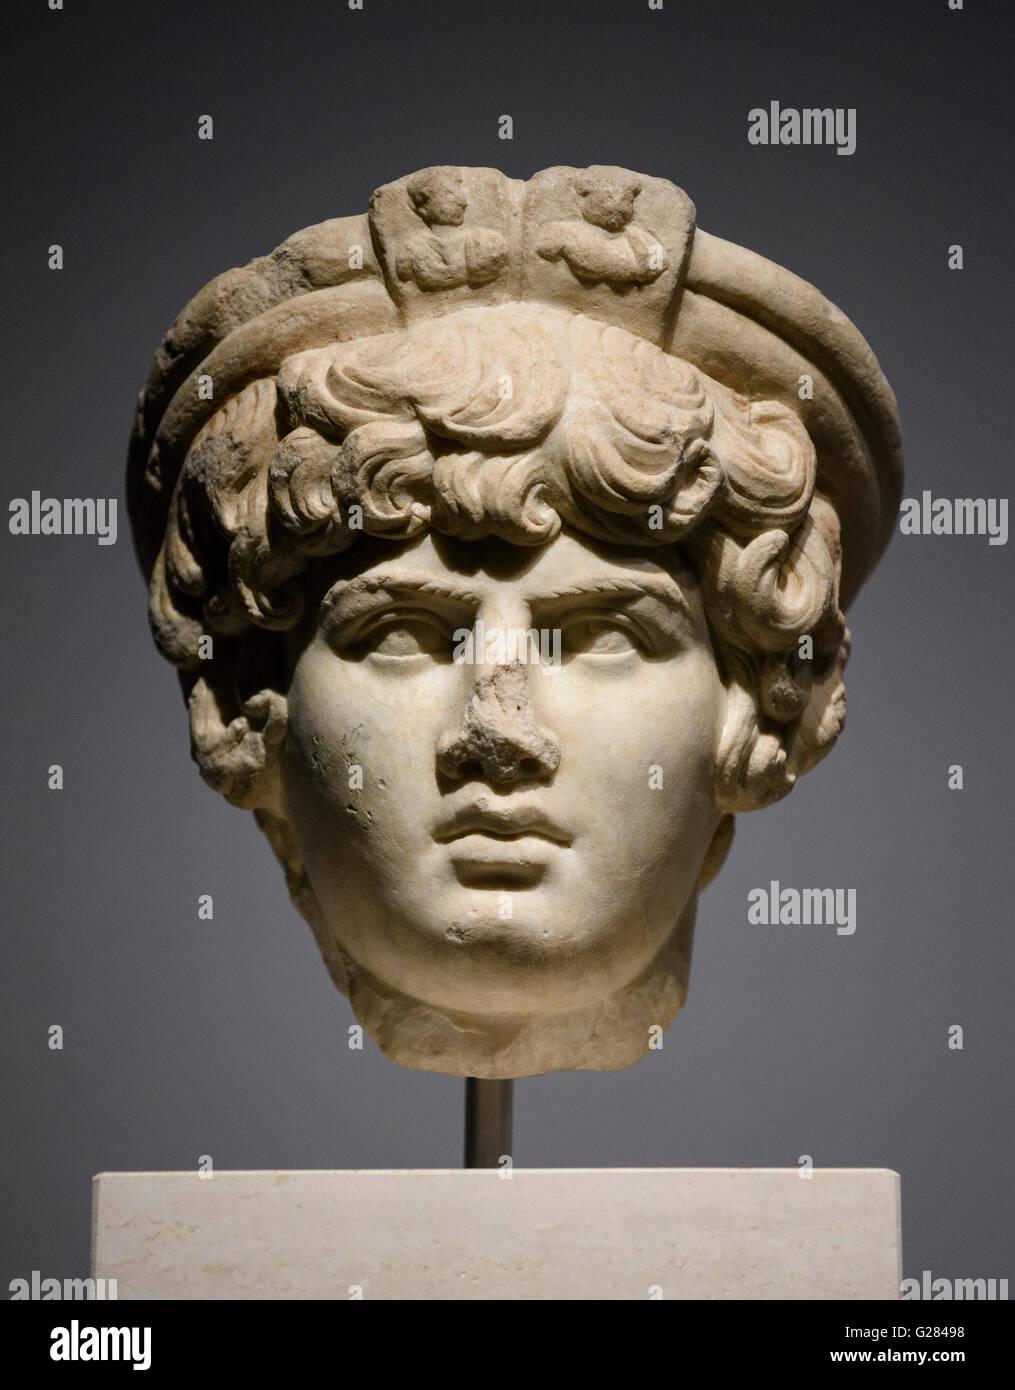 Rome. Italy. Museo Nazionale Romano. Palazzo Massimo alle Terme. Portrait of Antinous. Late Hadrianic period (AD - Stock Image